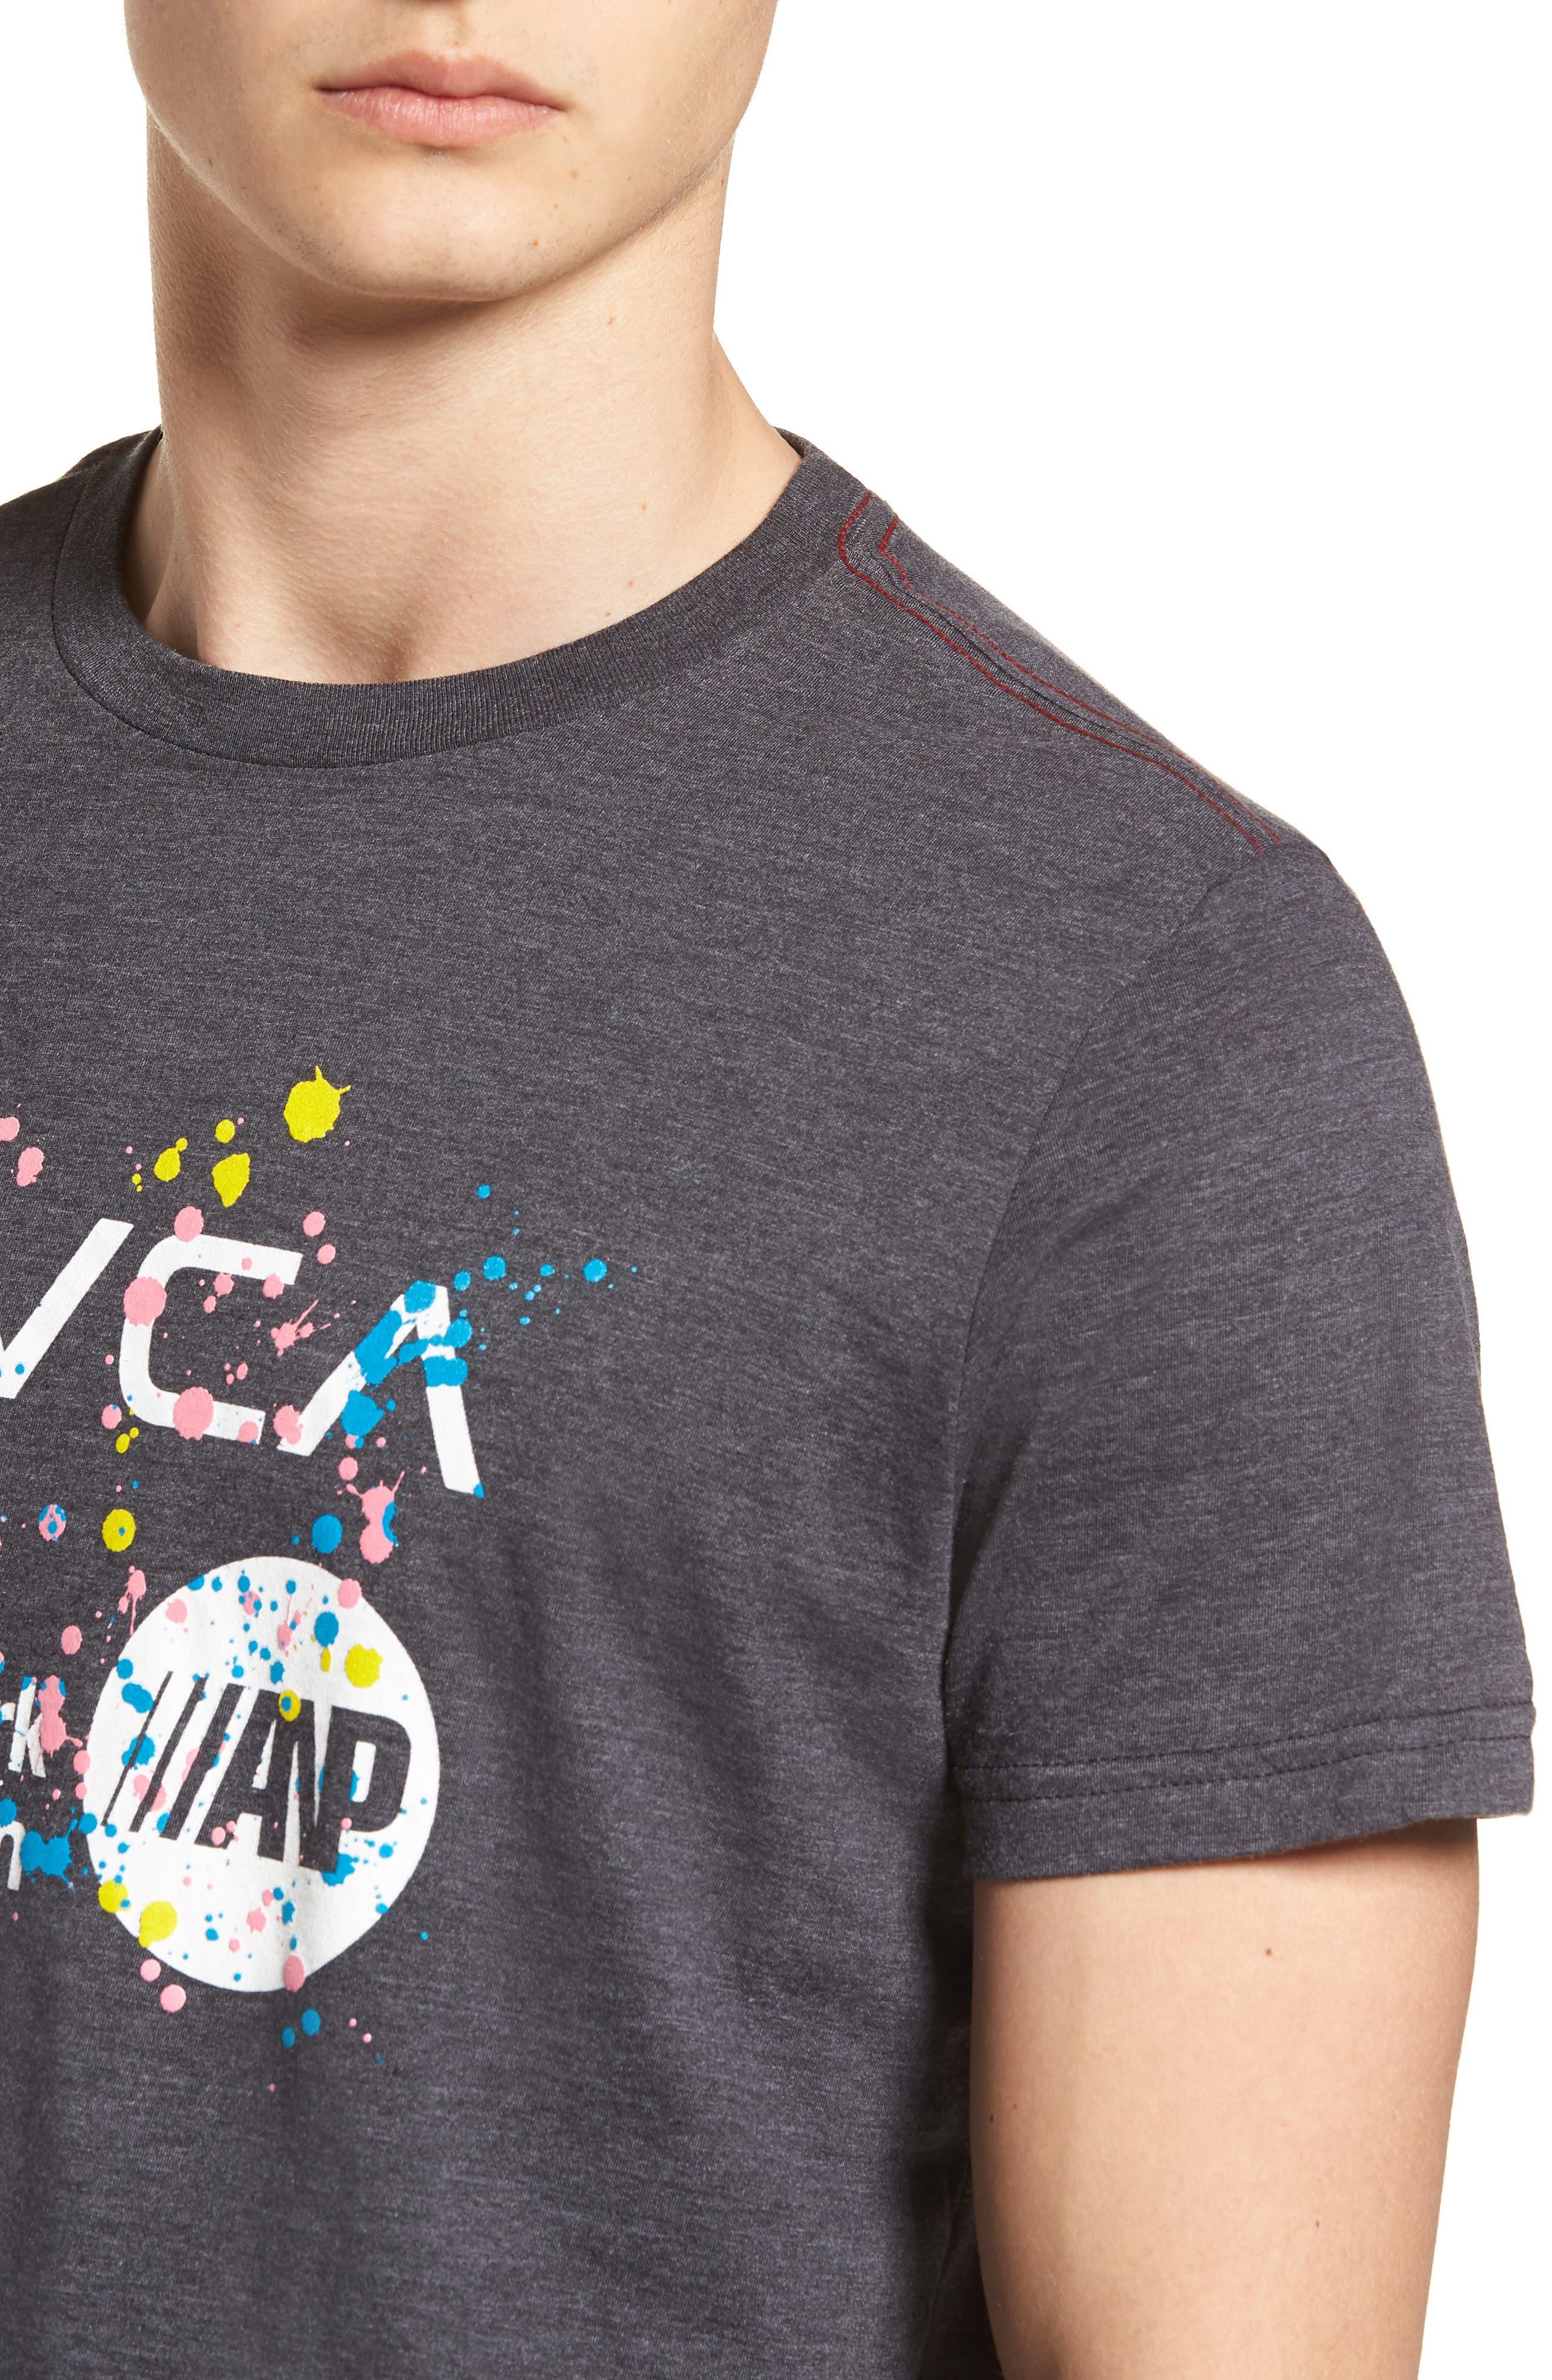 Dmote ANP T-Shirt,                             Alternate thumbnail 4, color,                             Black